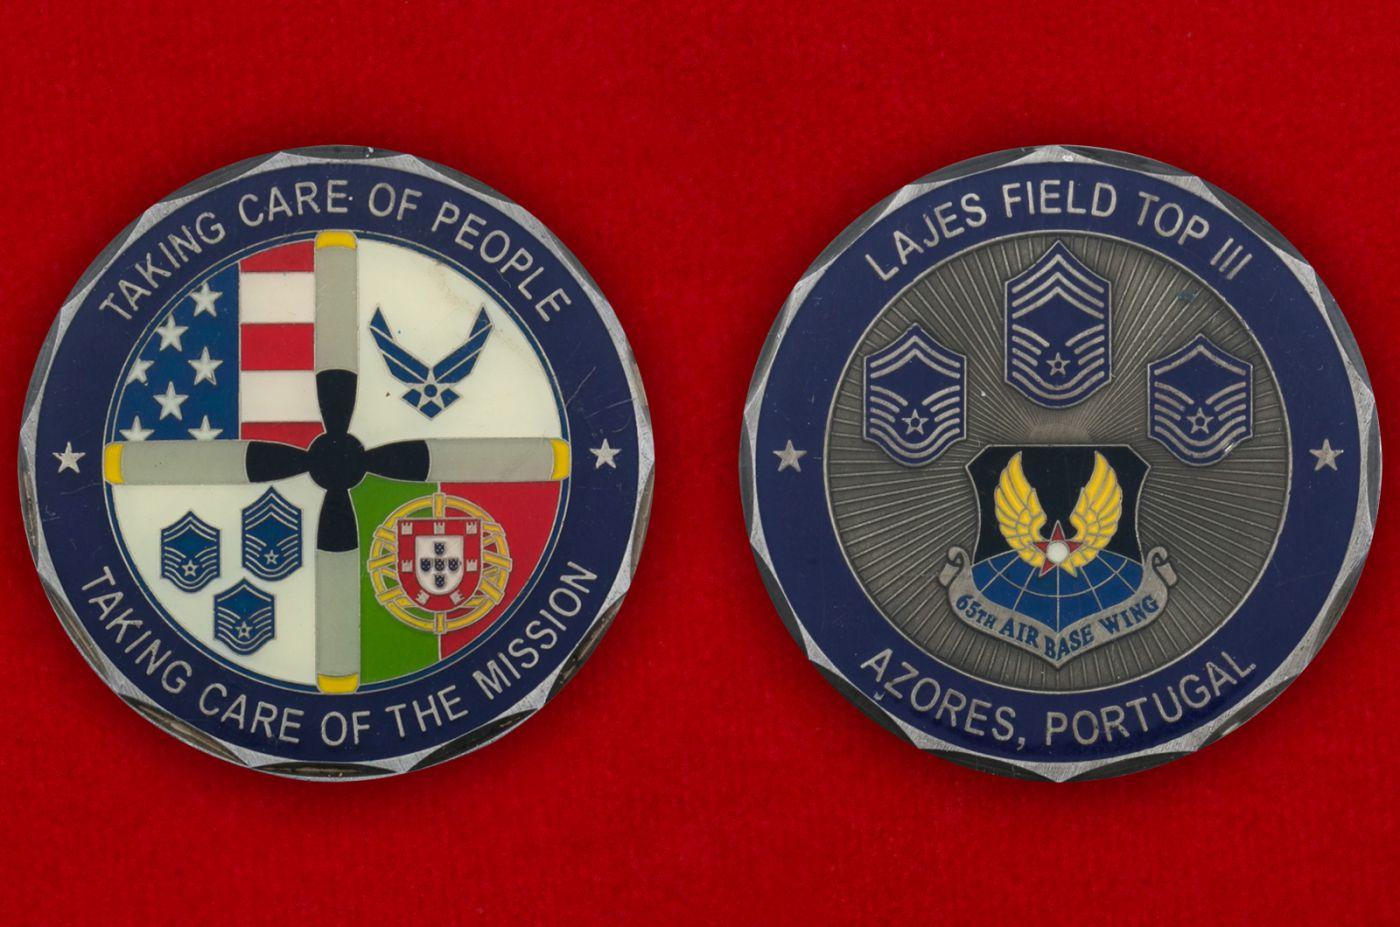 Челлендж коин авиагруппы ВВС США на базе Лажеш-Филд, Португалия - аверс и реверс